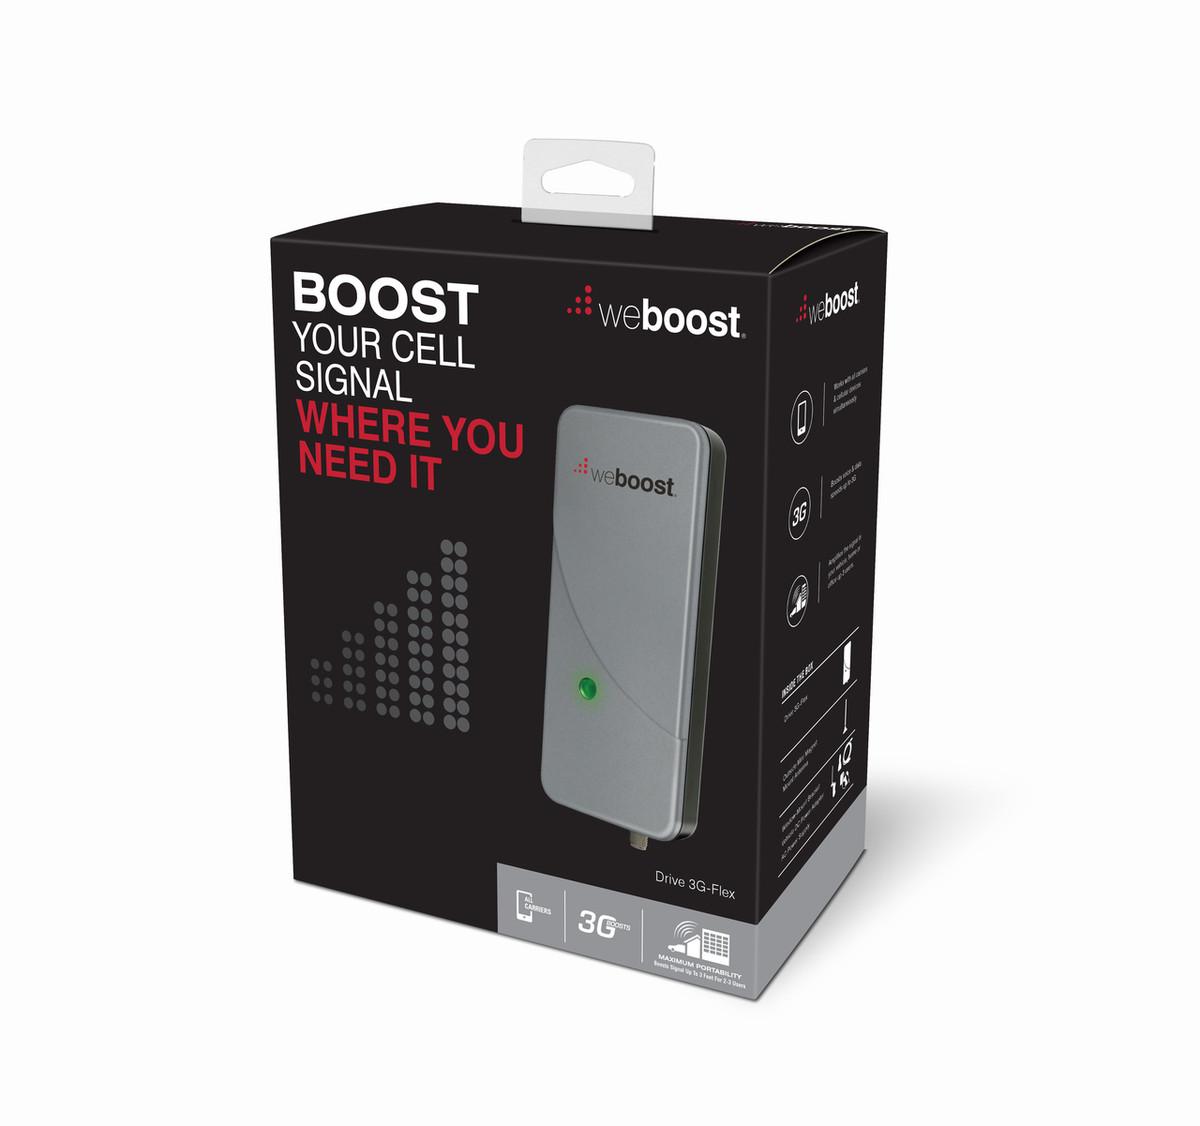 weBoost Drive 3G-Flex Cell Phone Signal Booster | 470113 Box View